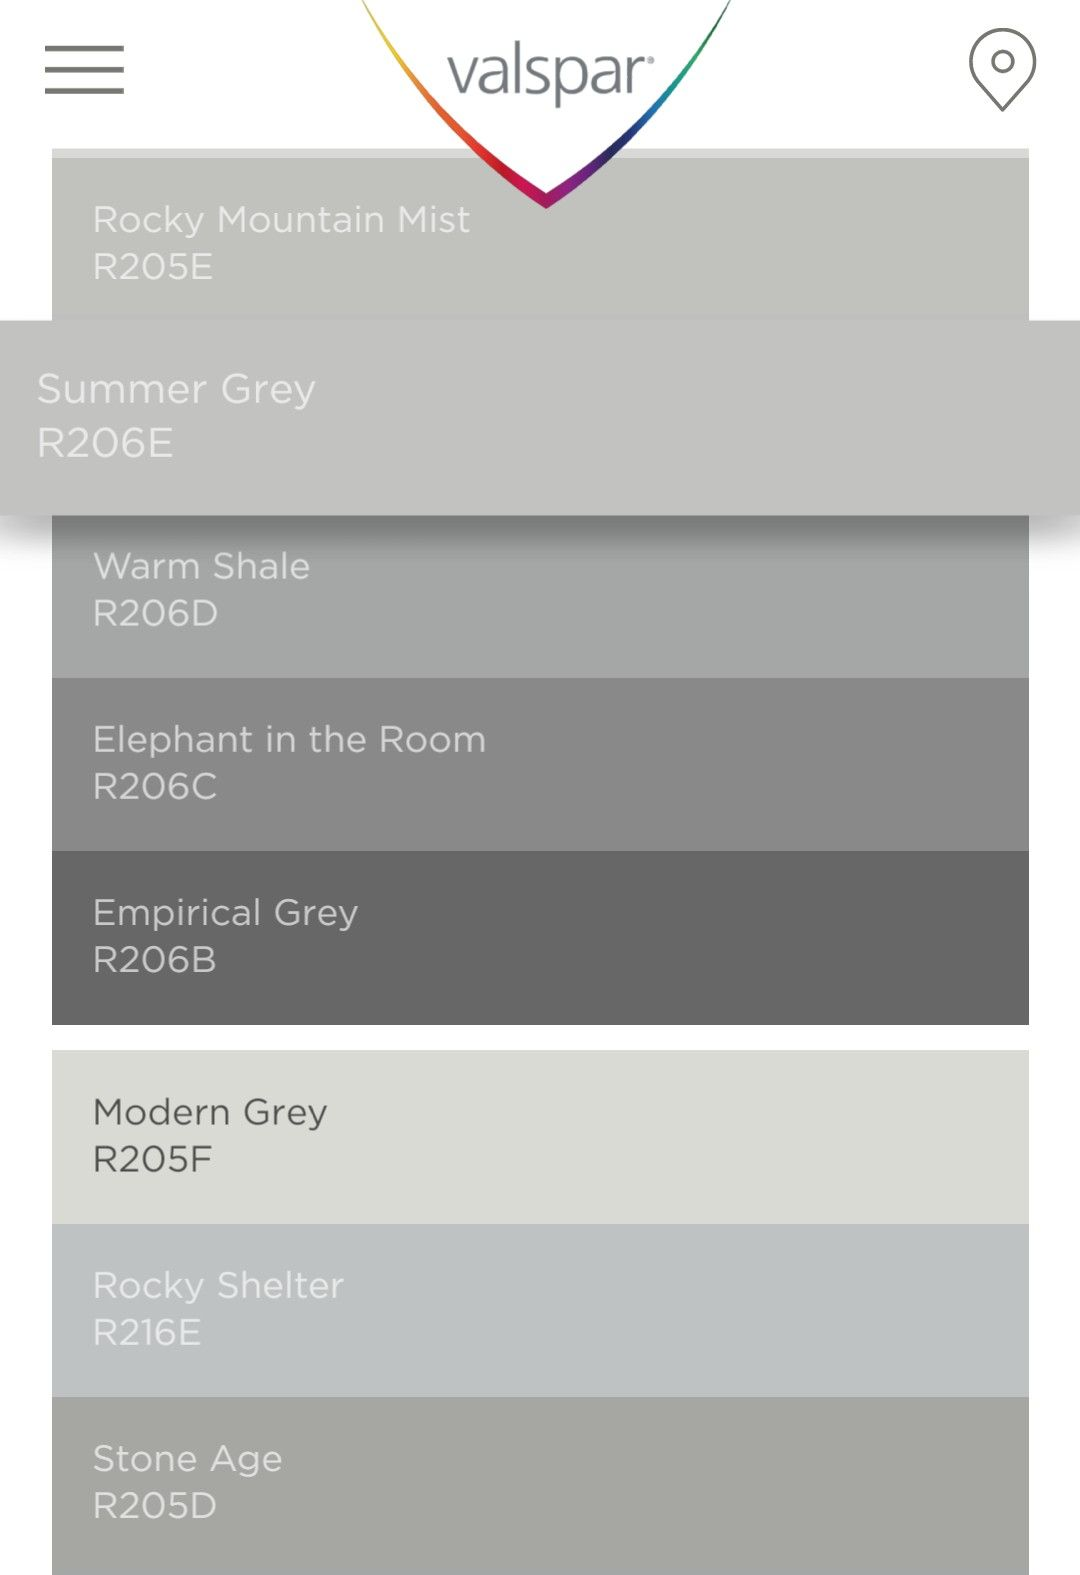 Valspar Paint Summer Grey Walls Valspar Paint Colors Gray Valspar Paint Colors Lowes Paint Colors